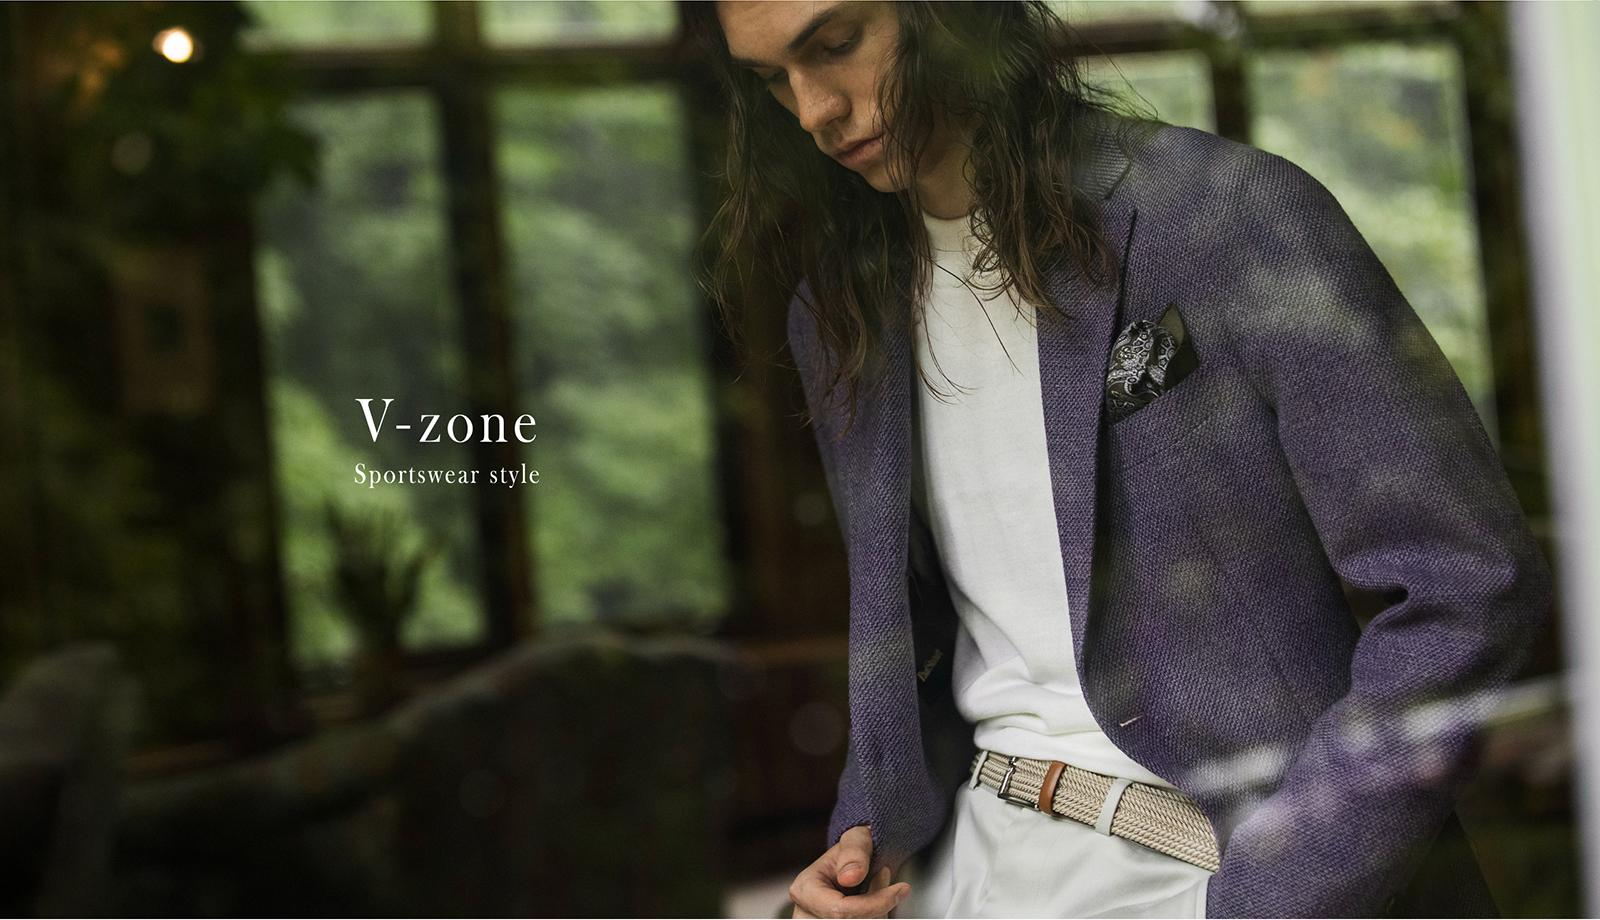 V-zone Sportswear style